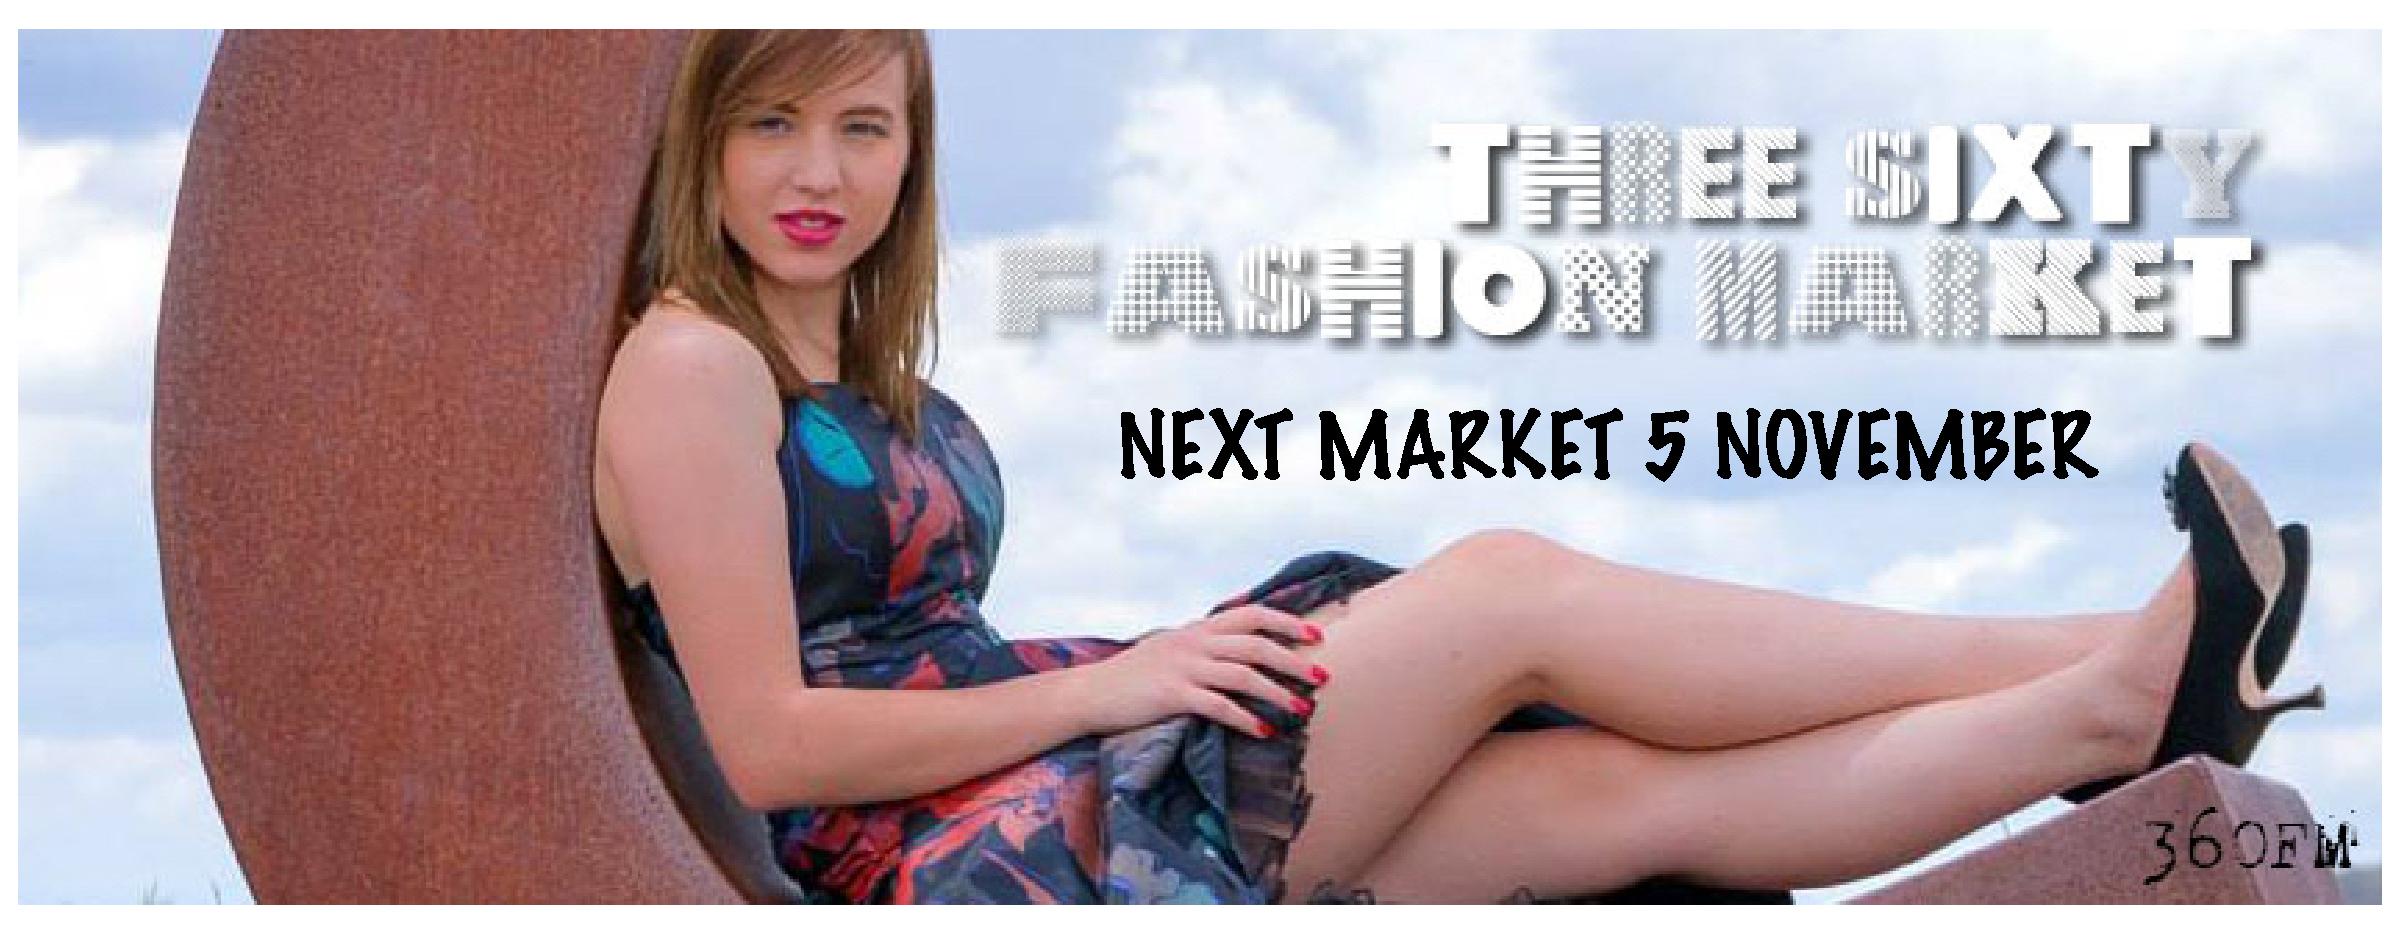 nov 5 market